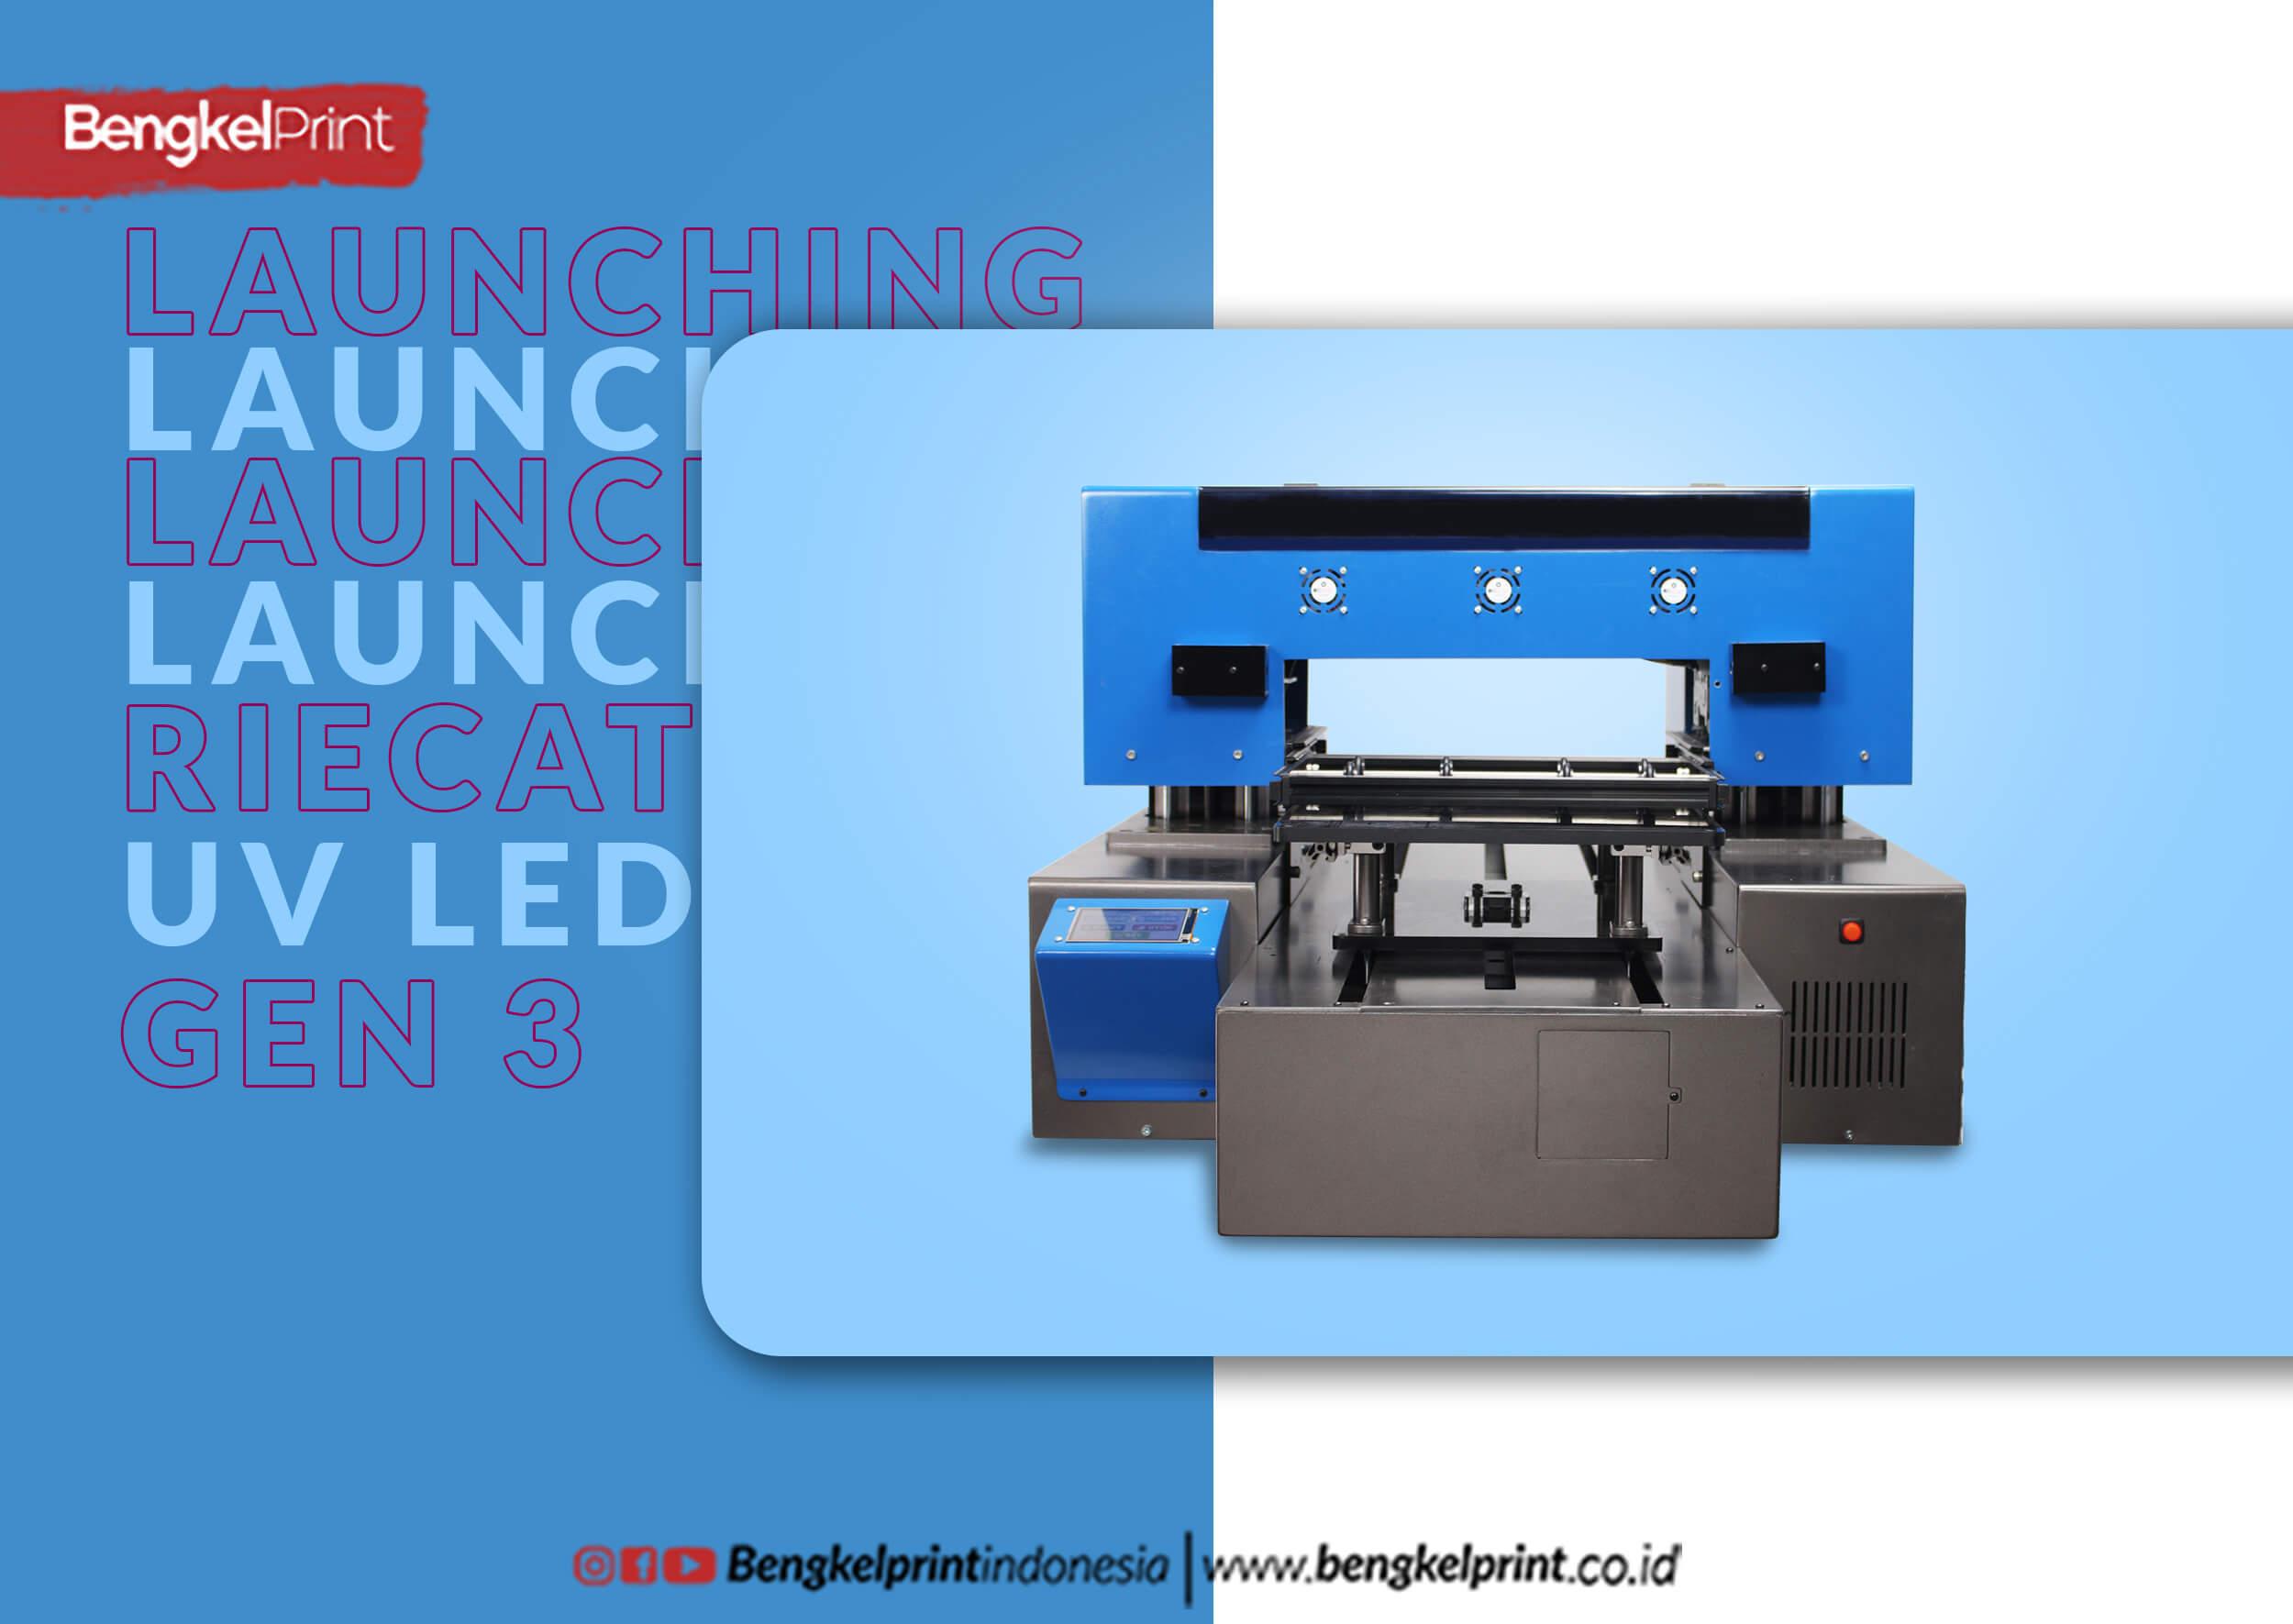 launching printer uv led riecat gen 3